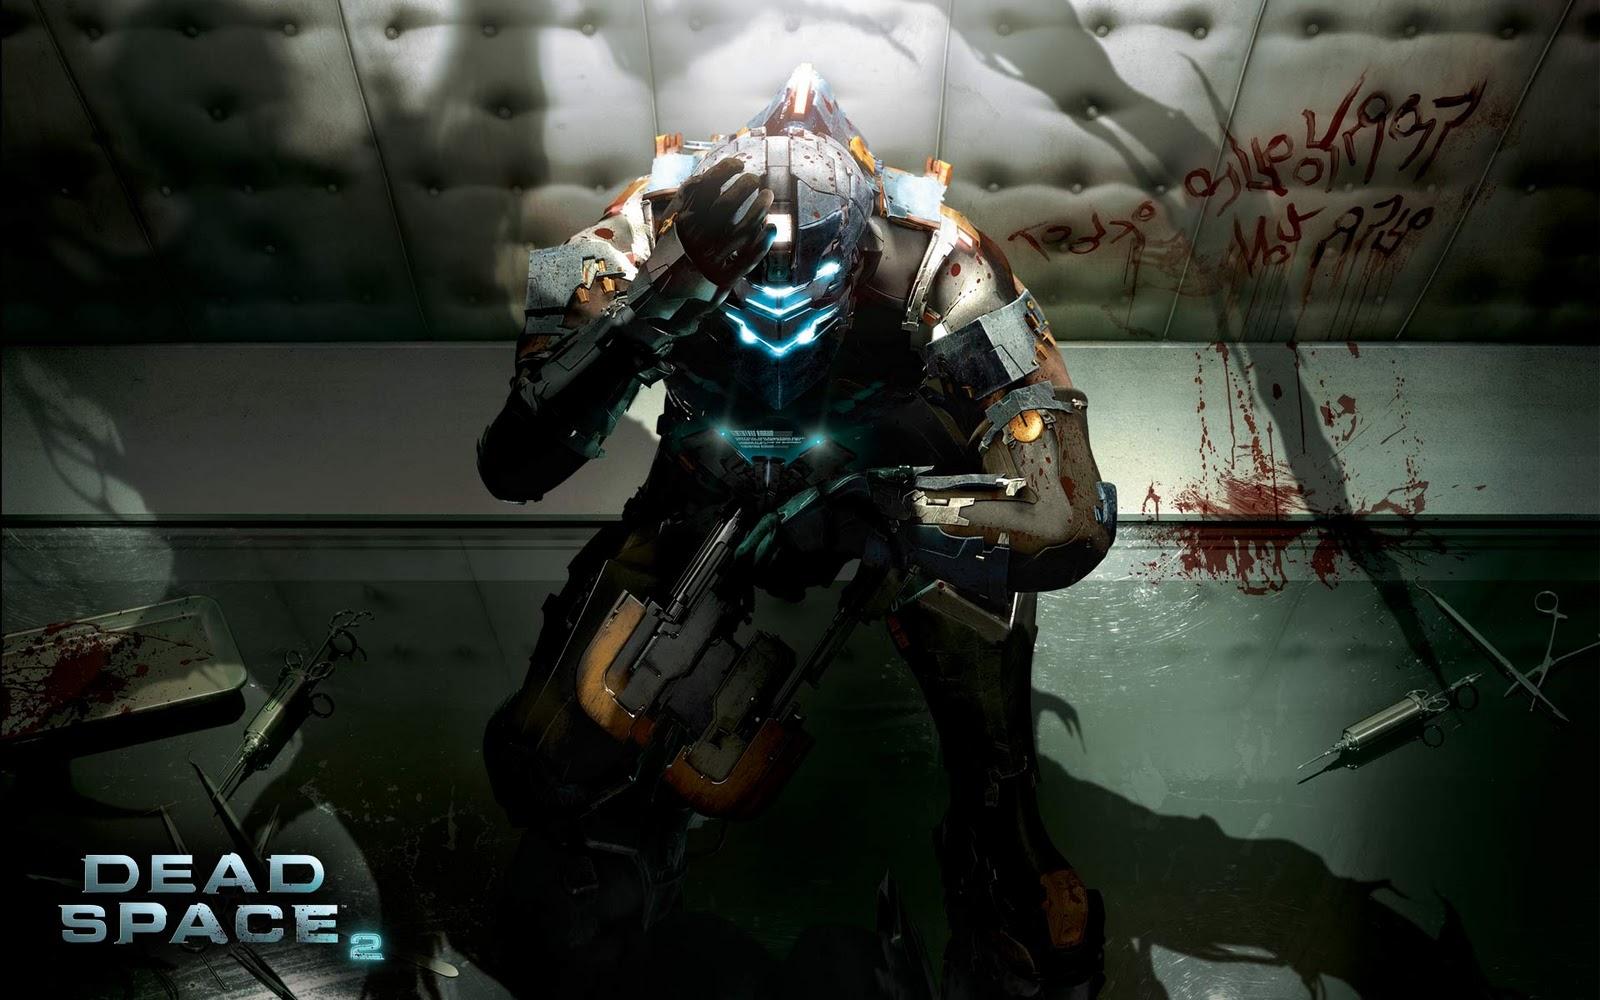 http://3.bp.blogspot.com/_5r-8lYWuFQQ/TUWSqrh2ptI/AAAAAAAAAwg/kKQK1t5Bi_U/s1600/dead_space_2_game-wide.jpg